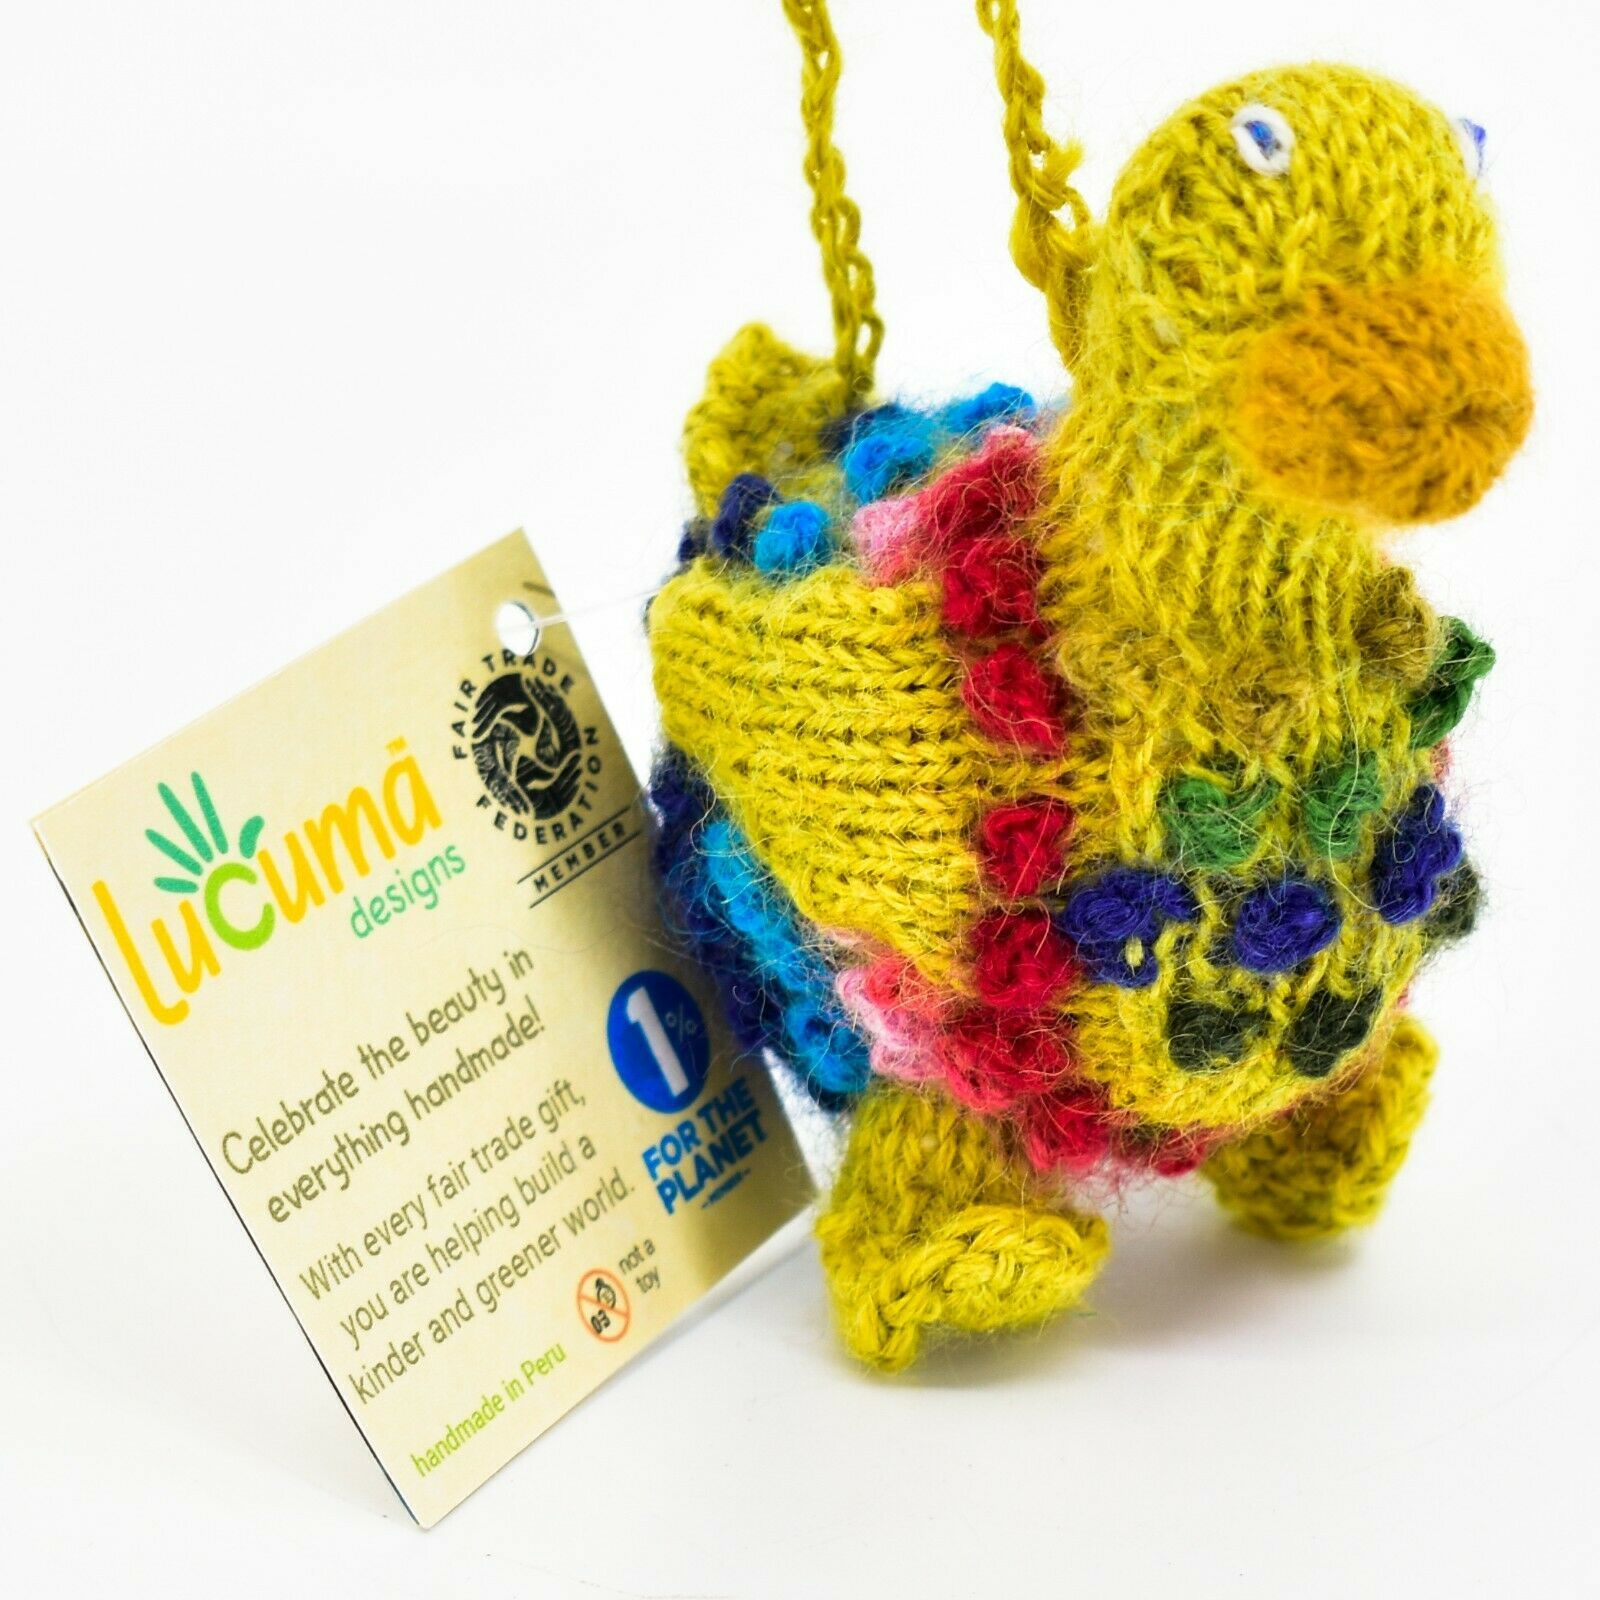 Handknit Alpaca Wool Whimsical Hanging Duck Bird Ornament Handmade in Peru